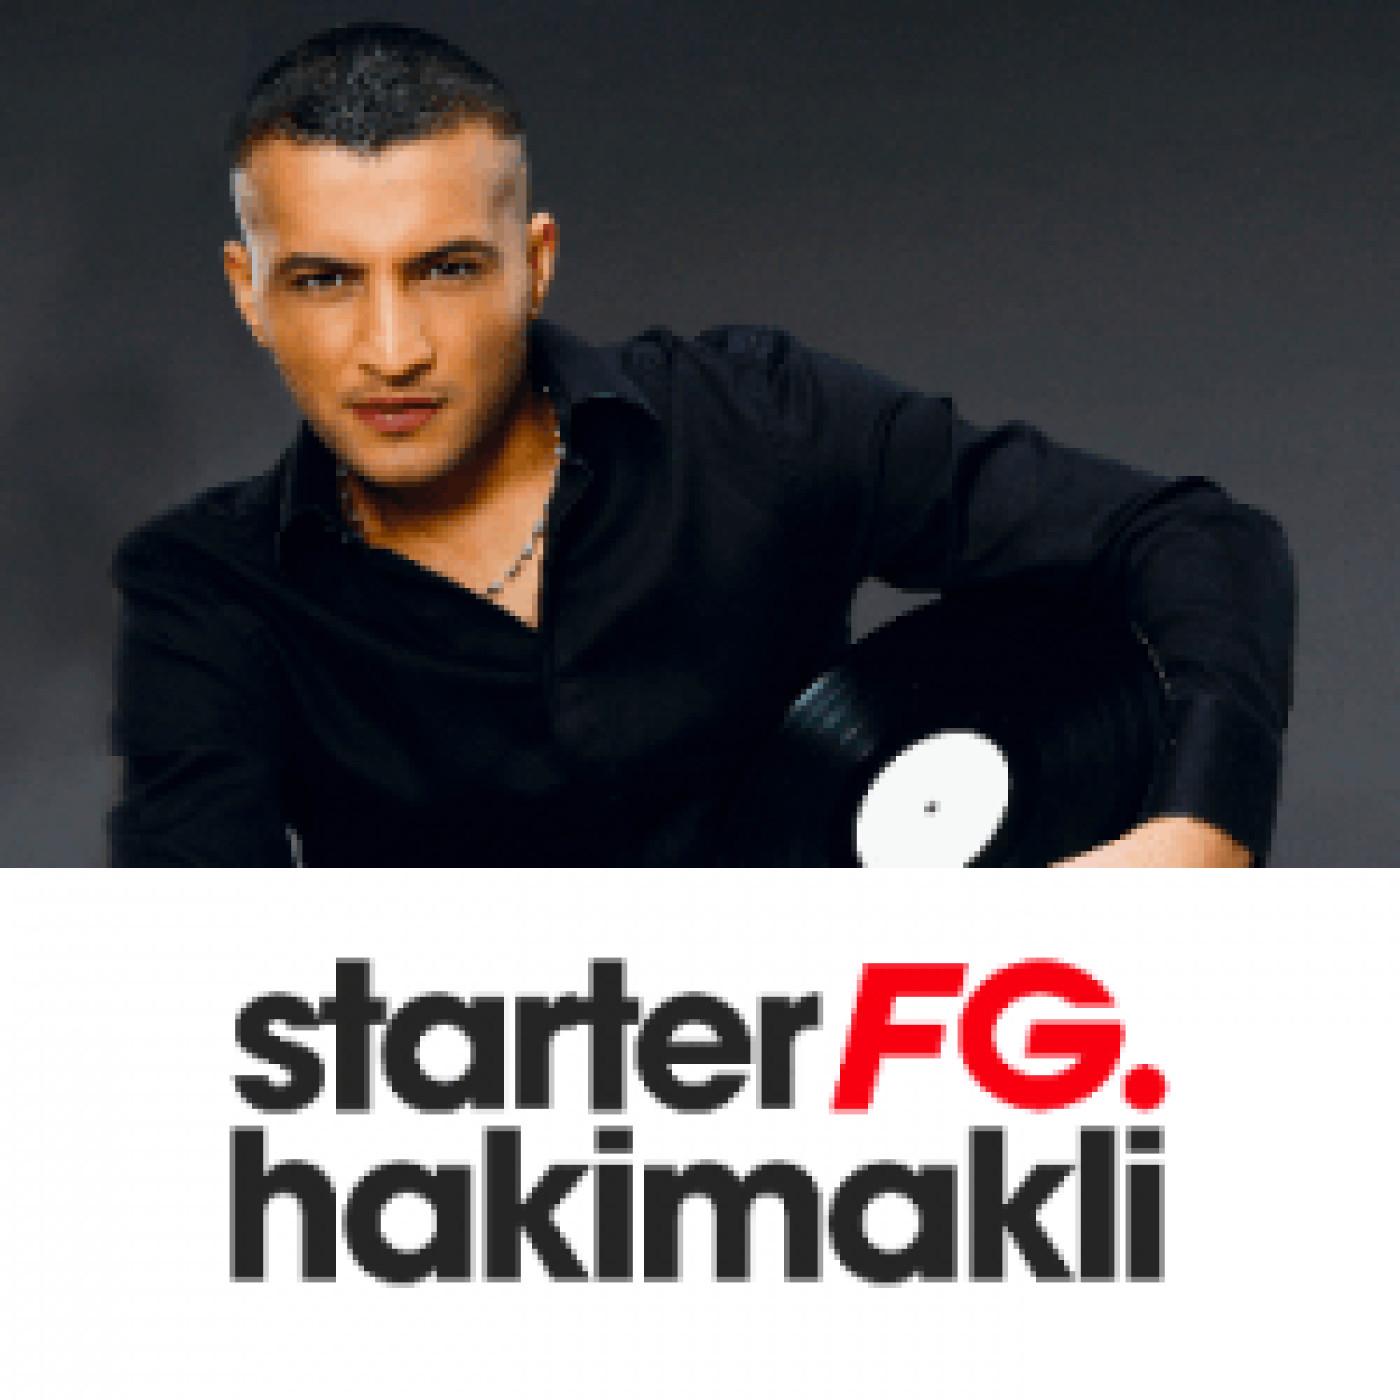 STARTER FG BY HAKIMAKLI MERCREDI 30 SEPTEMBRE 2020